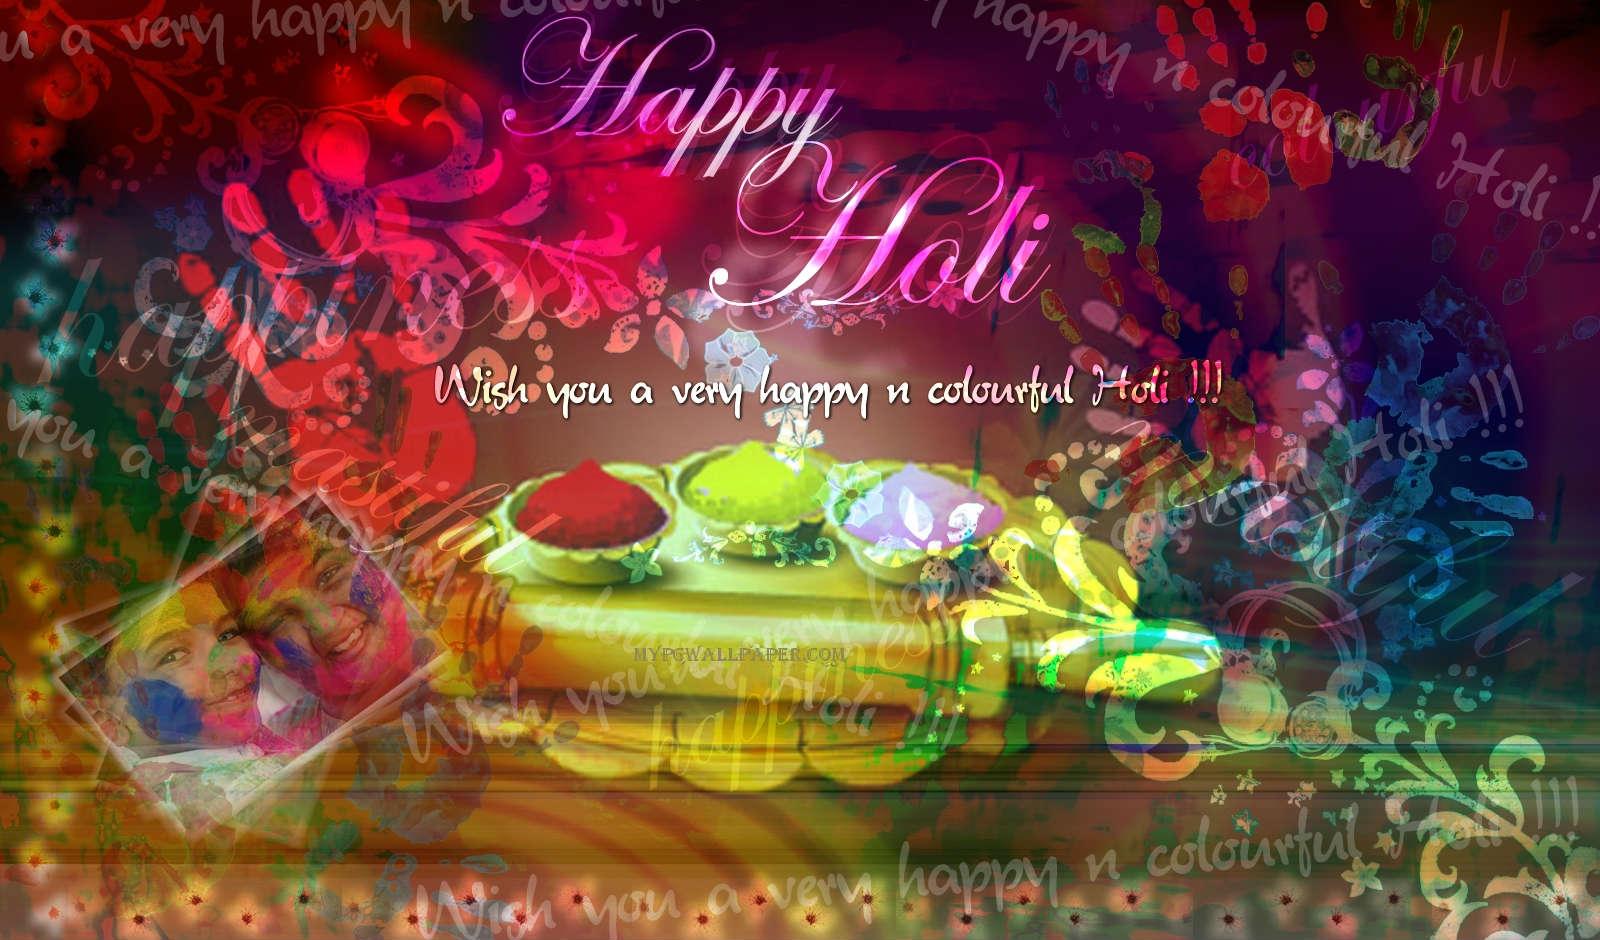 Happy Holi Wallpaper Happy Holi Wallpaper 1600x940